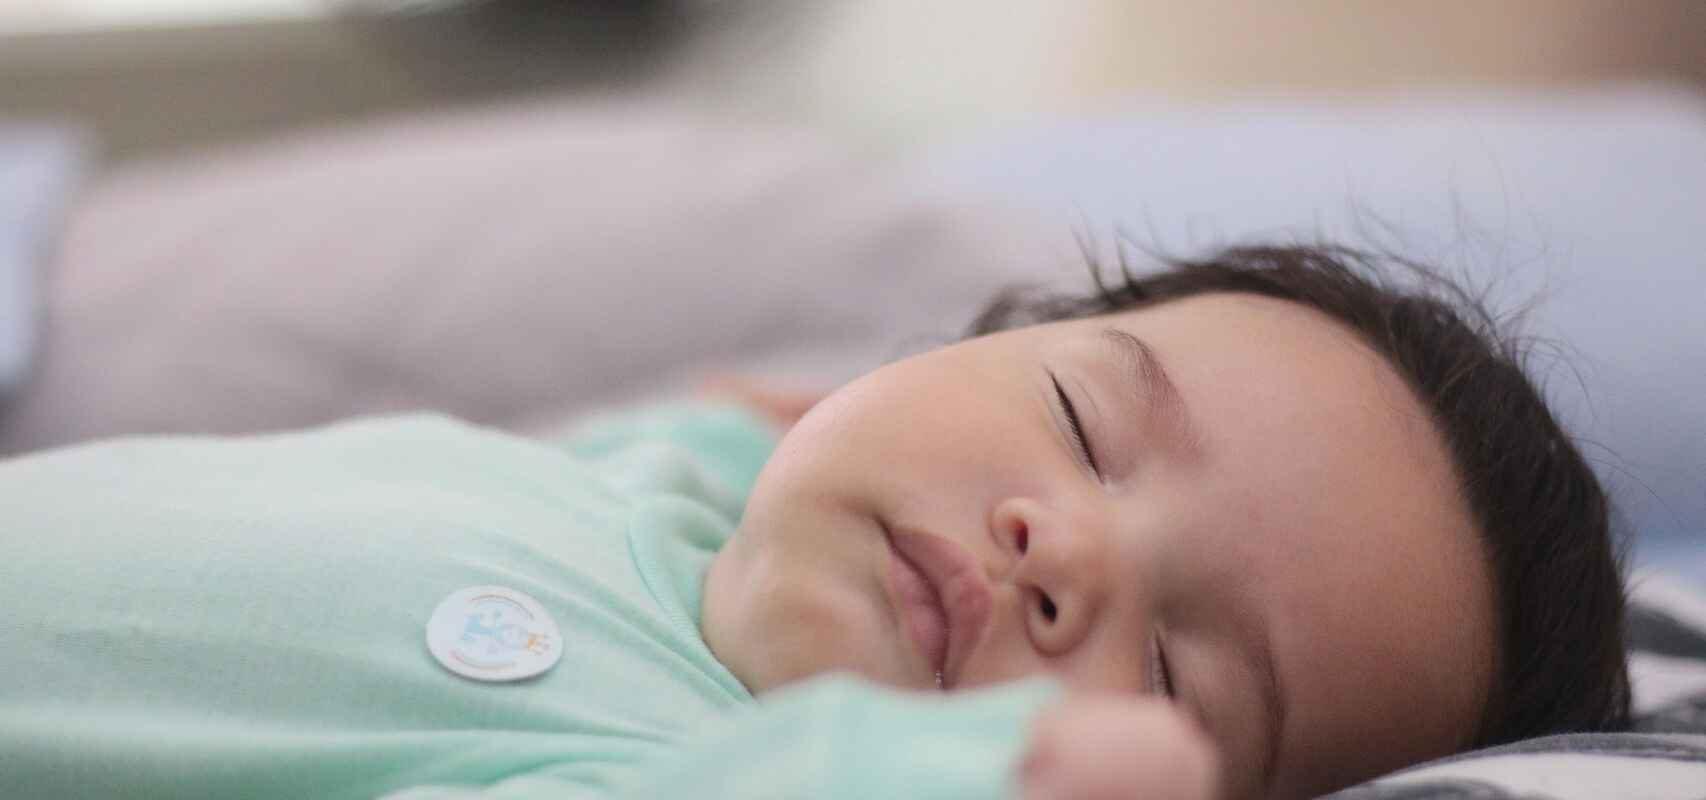 Padre abusador: Mandó a su bebito de 3 meses al hospital tras darle una golpiza